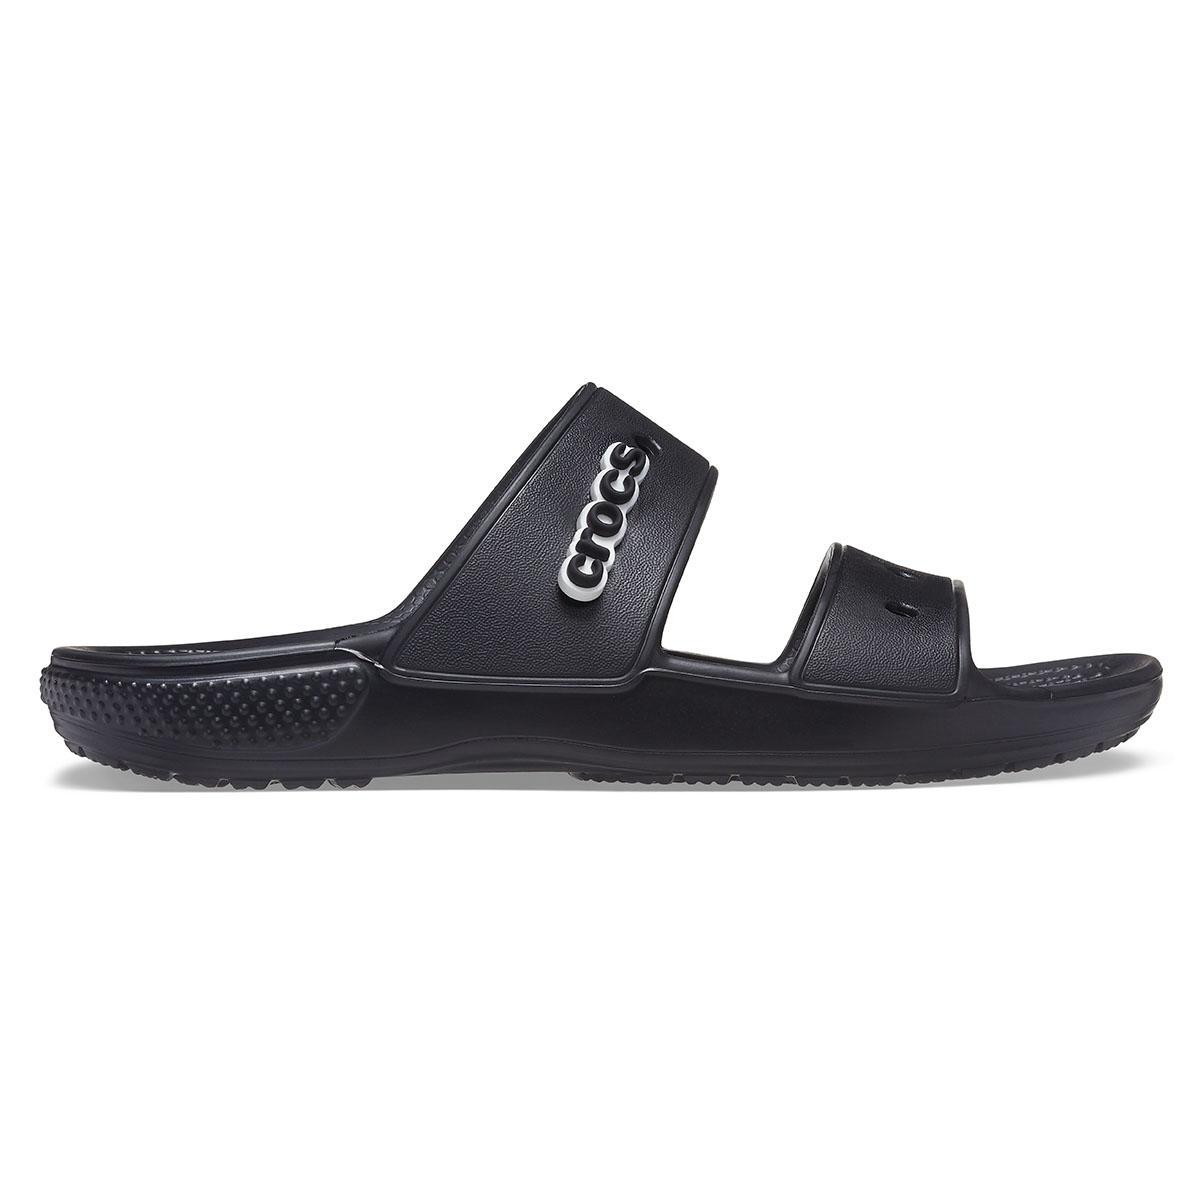 Classic Crocs Sandal - Siyah